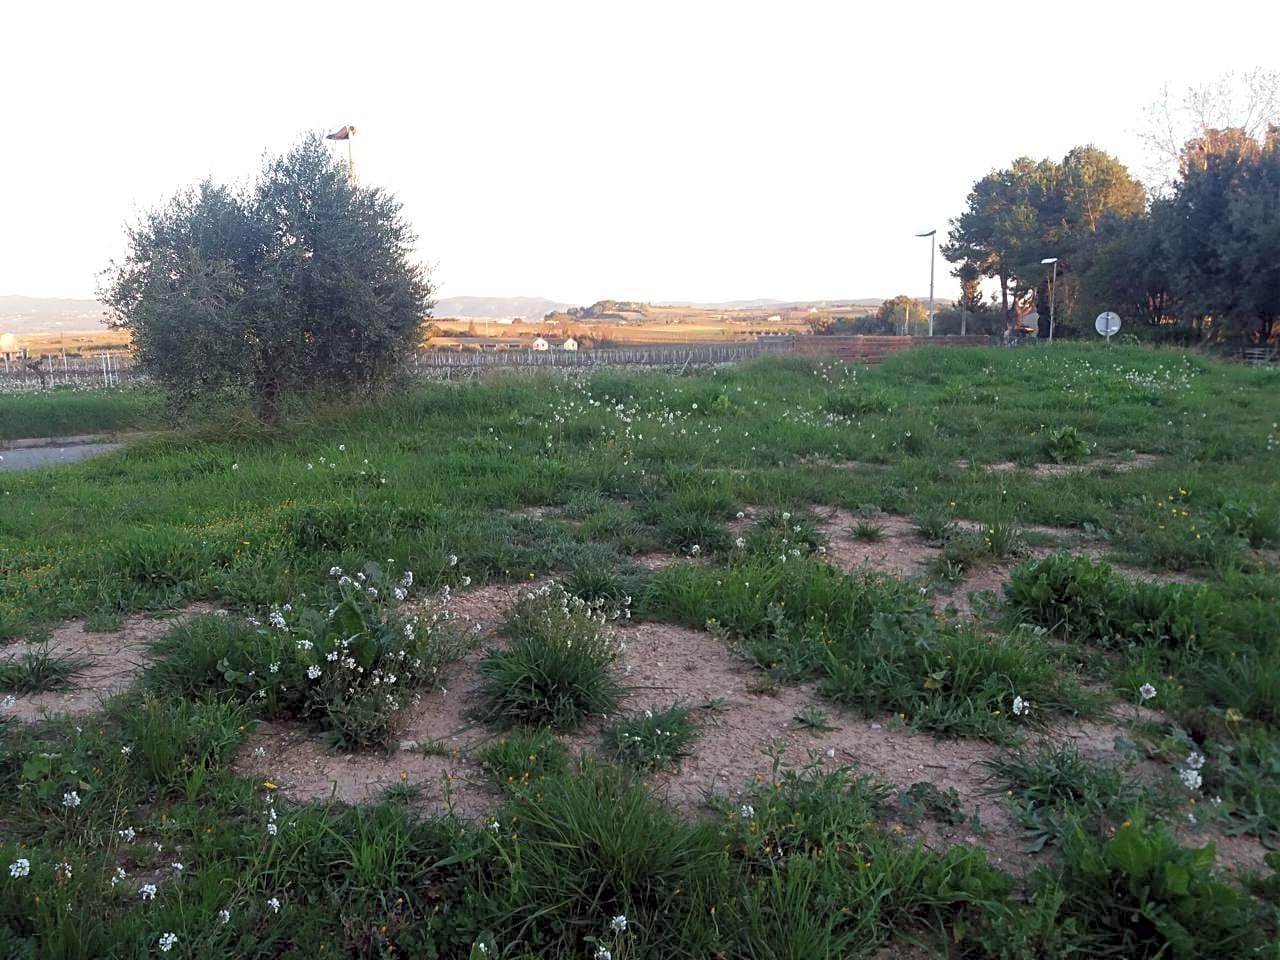 Solar urbà en Font-rubí. Este terreno edificable se encuentra en fontrubí, barcelona. es